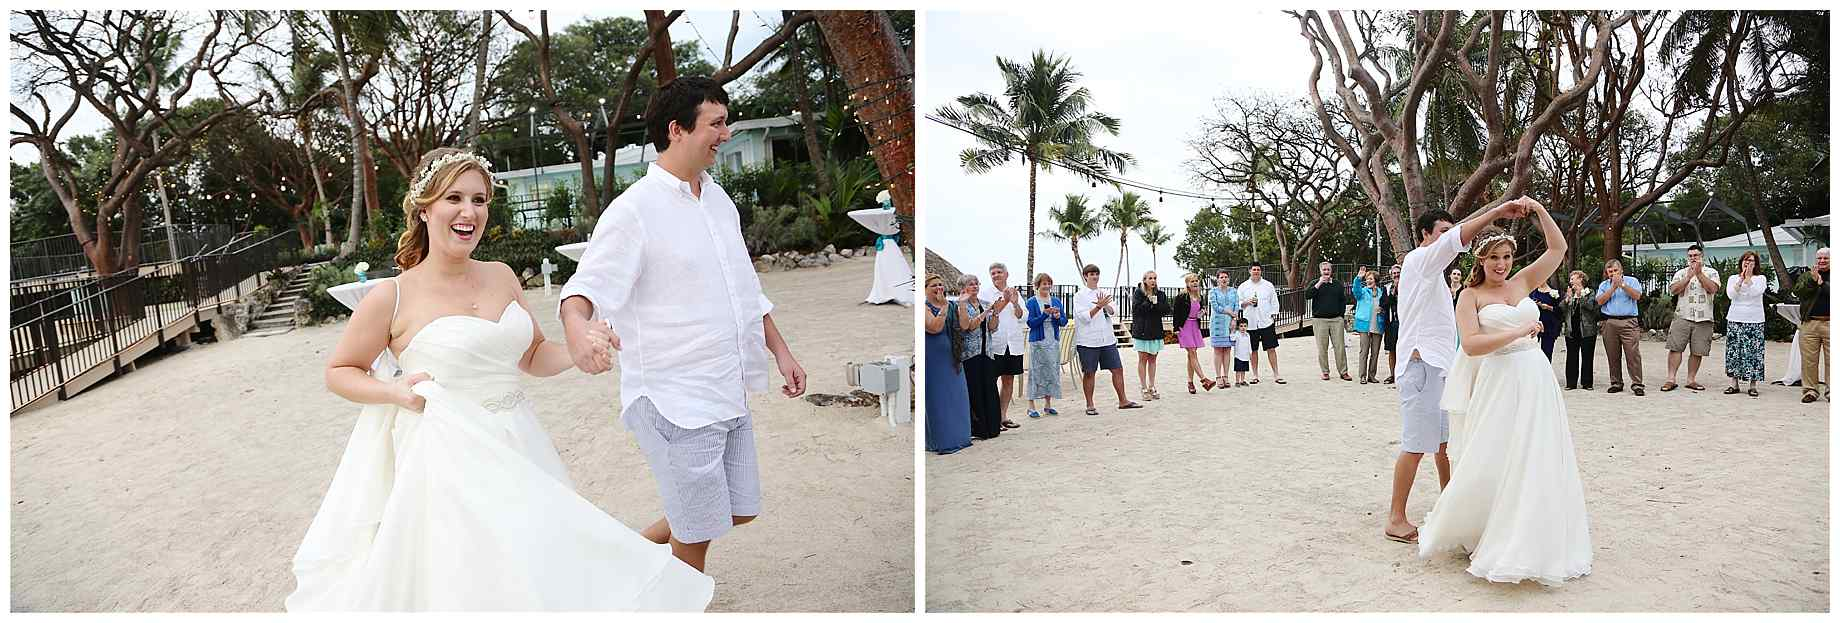 Key-Largo-Beach-Wedding-Photos-045